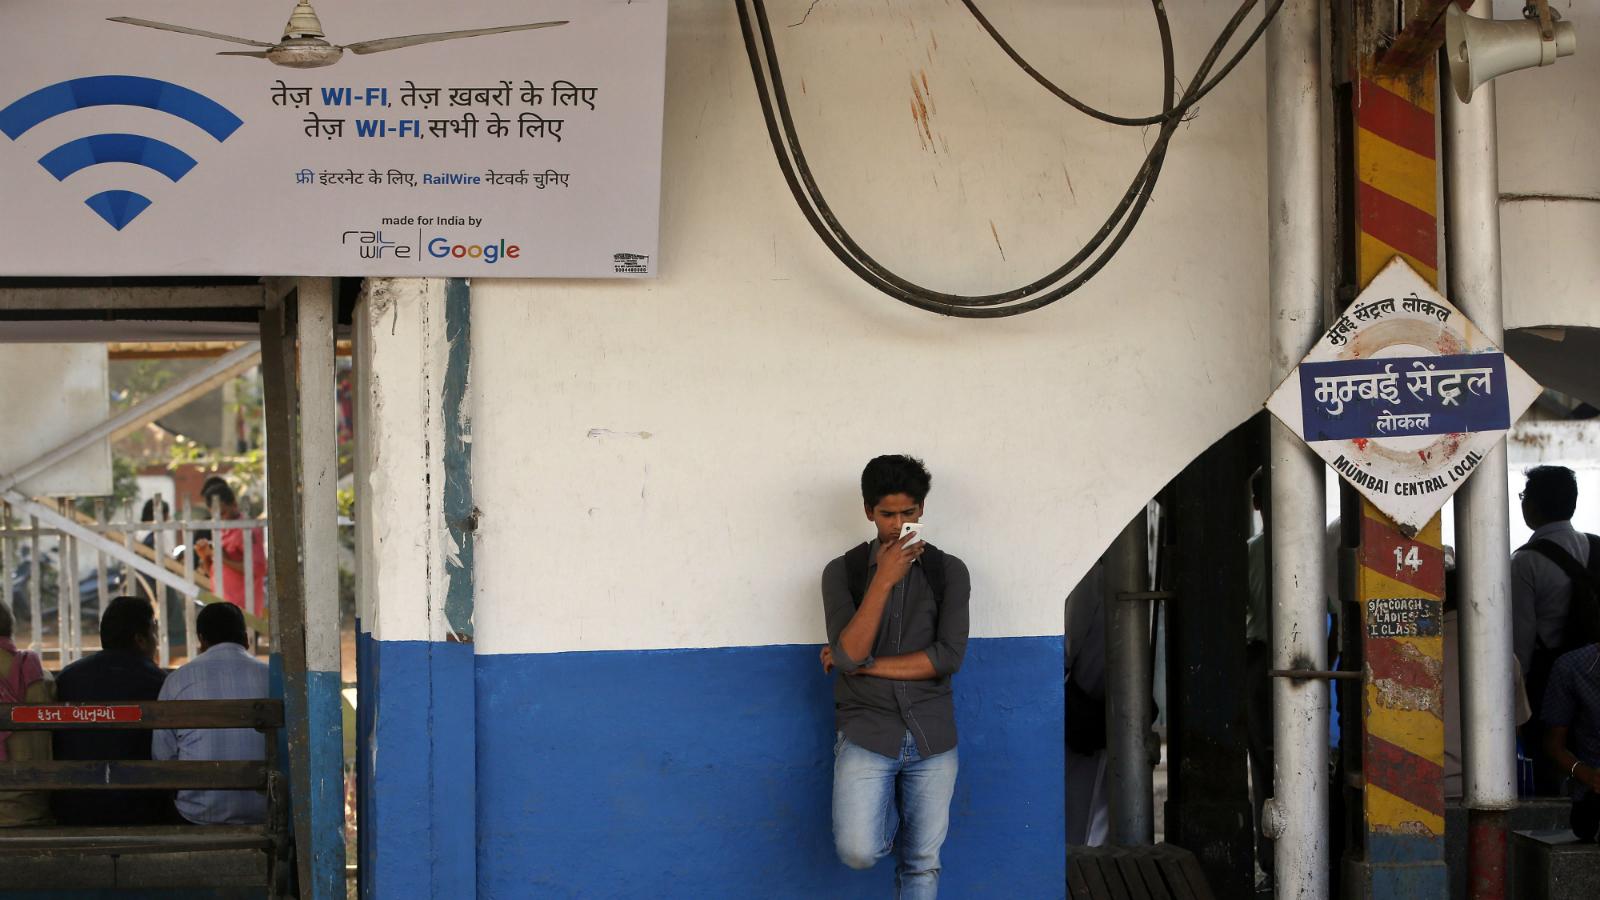 Wi-Fi- Railways-Indian railways-internet